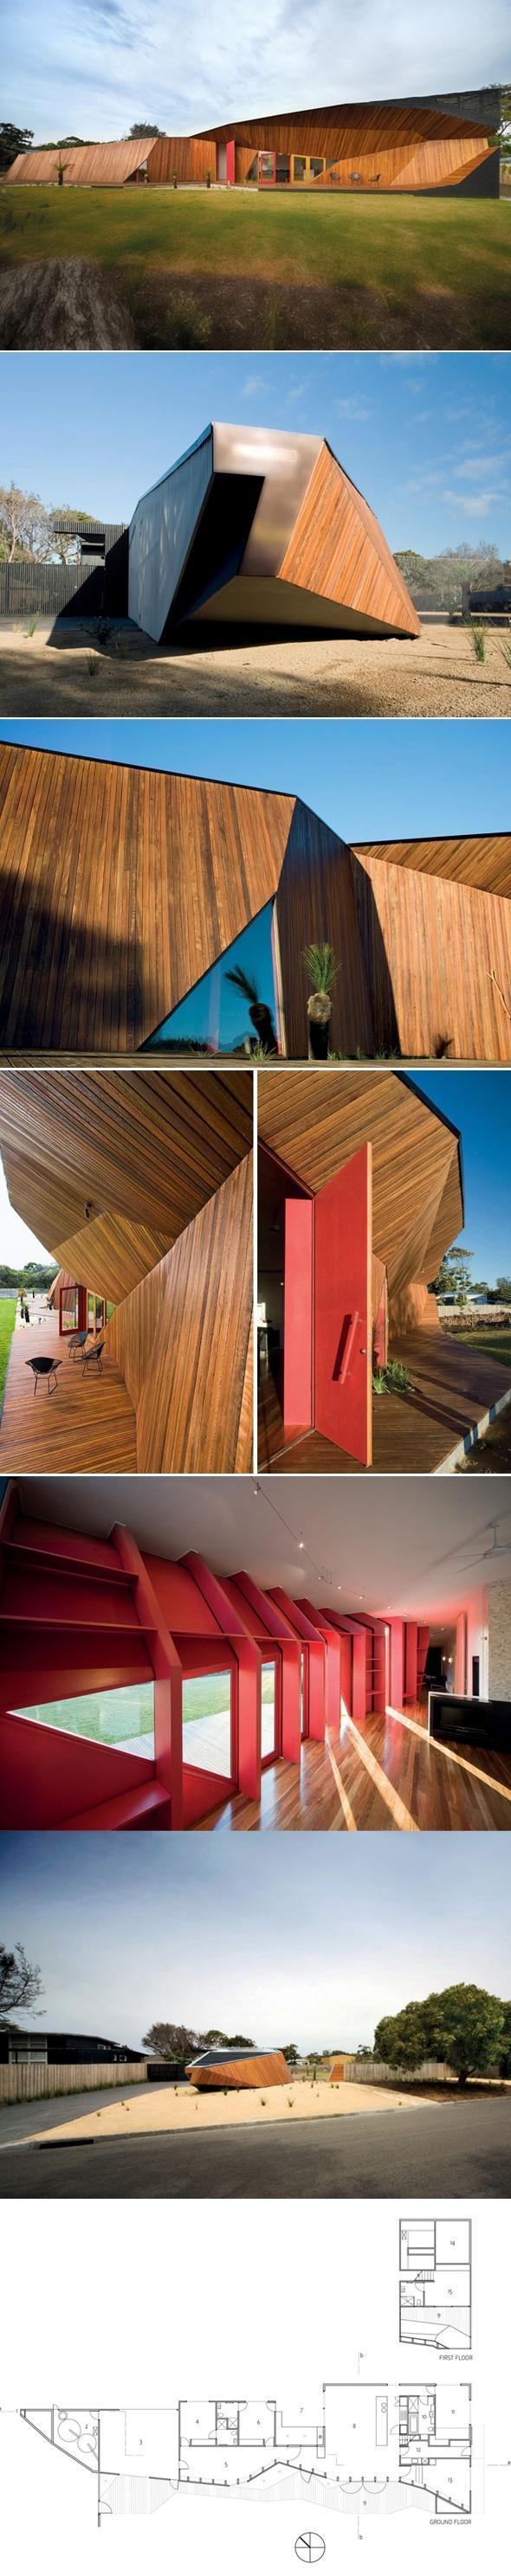 ARCHITECTURE U003eu003eu003e Maison Letterbox Par McBride Charles Ryan